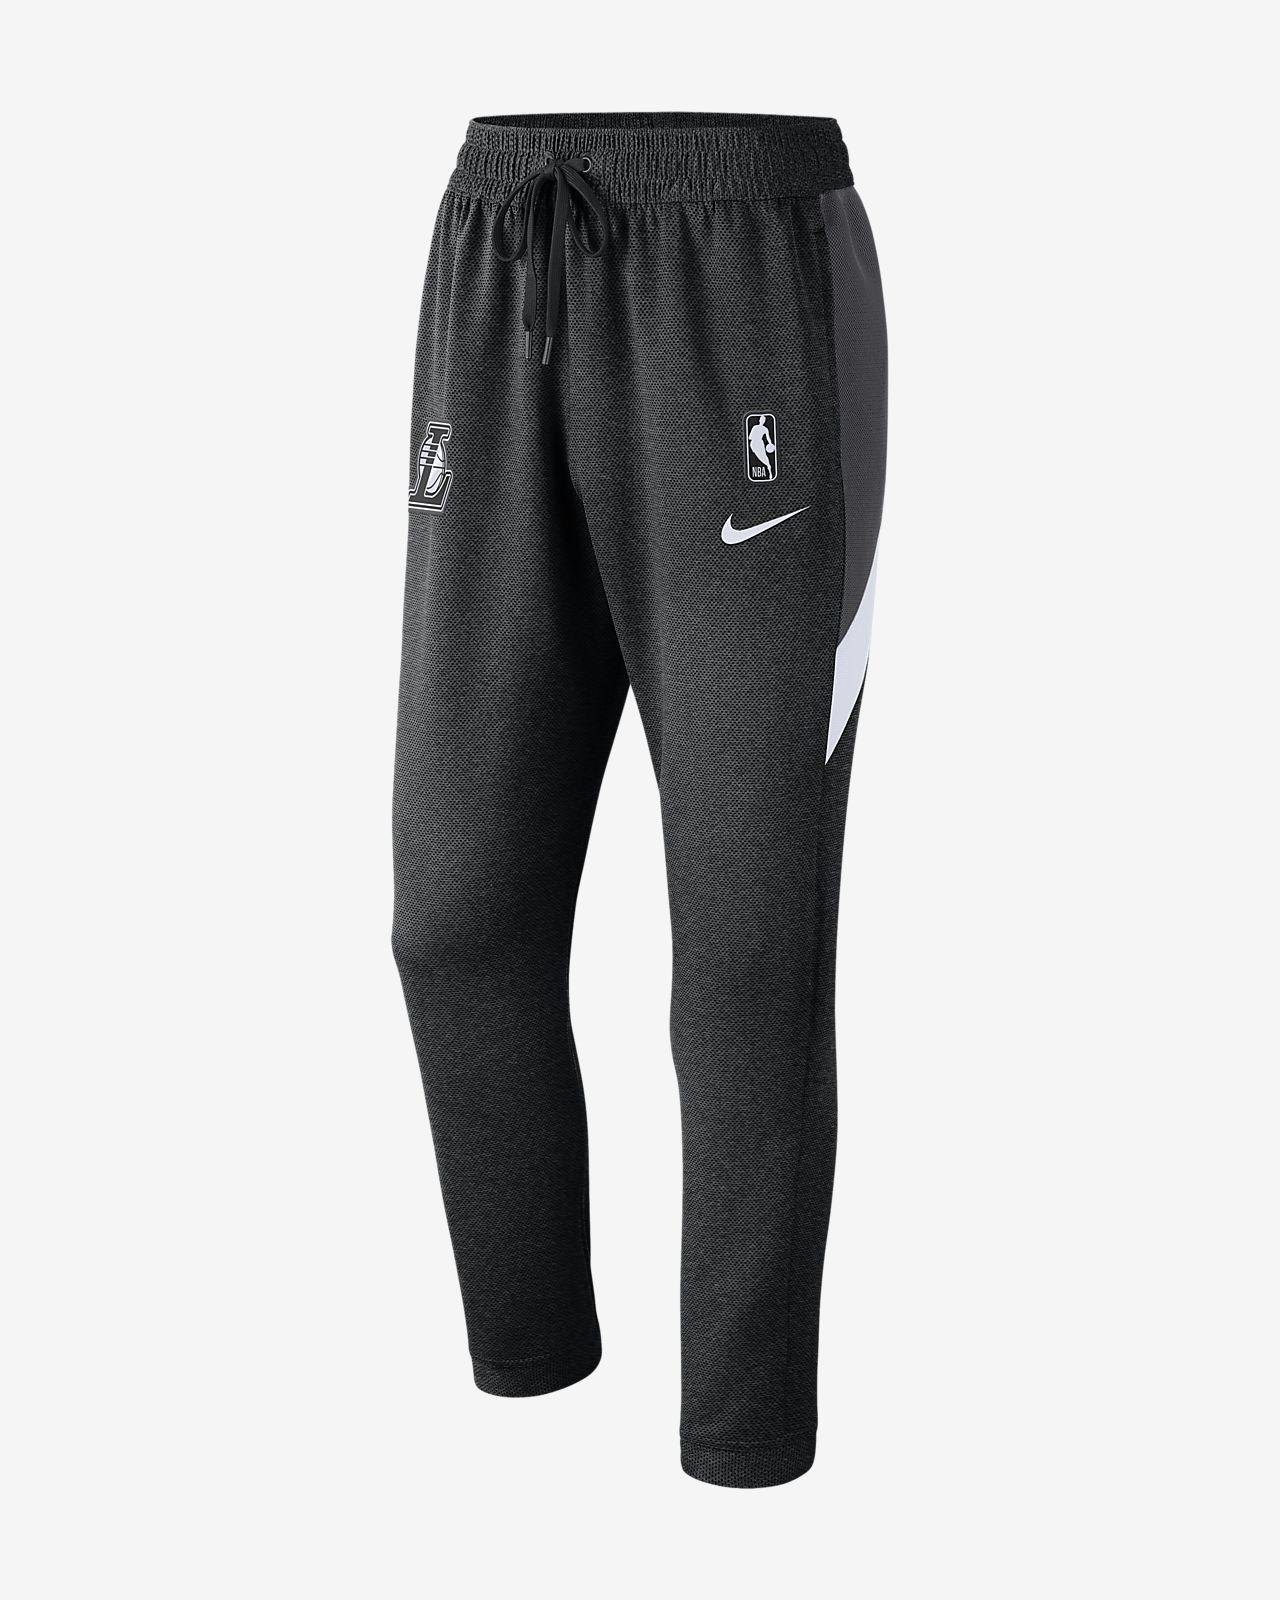 Pantalones de la NBA para hombre Los Angeles Lakers Nike Therma Flex Showtime